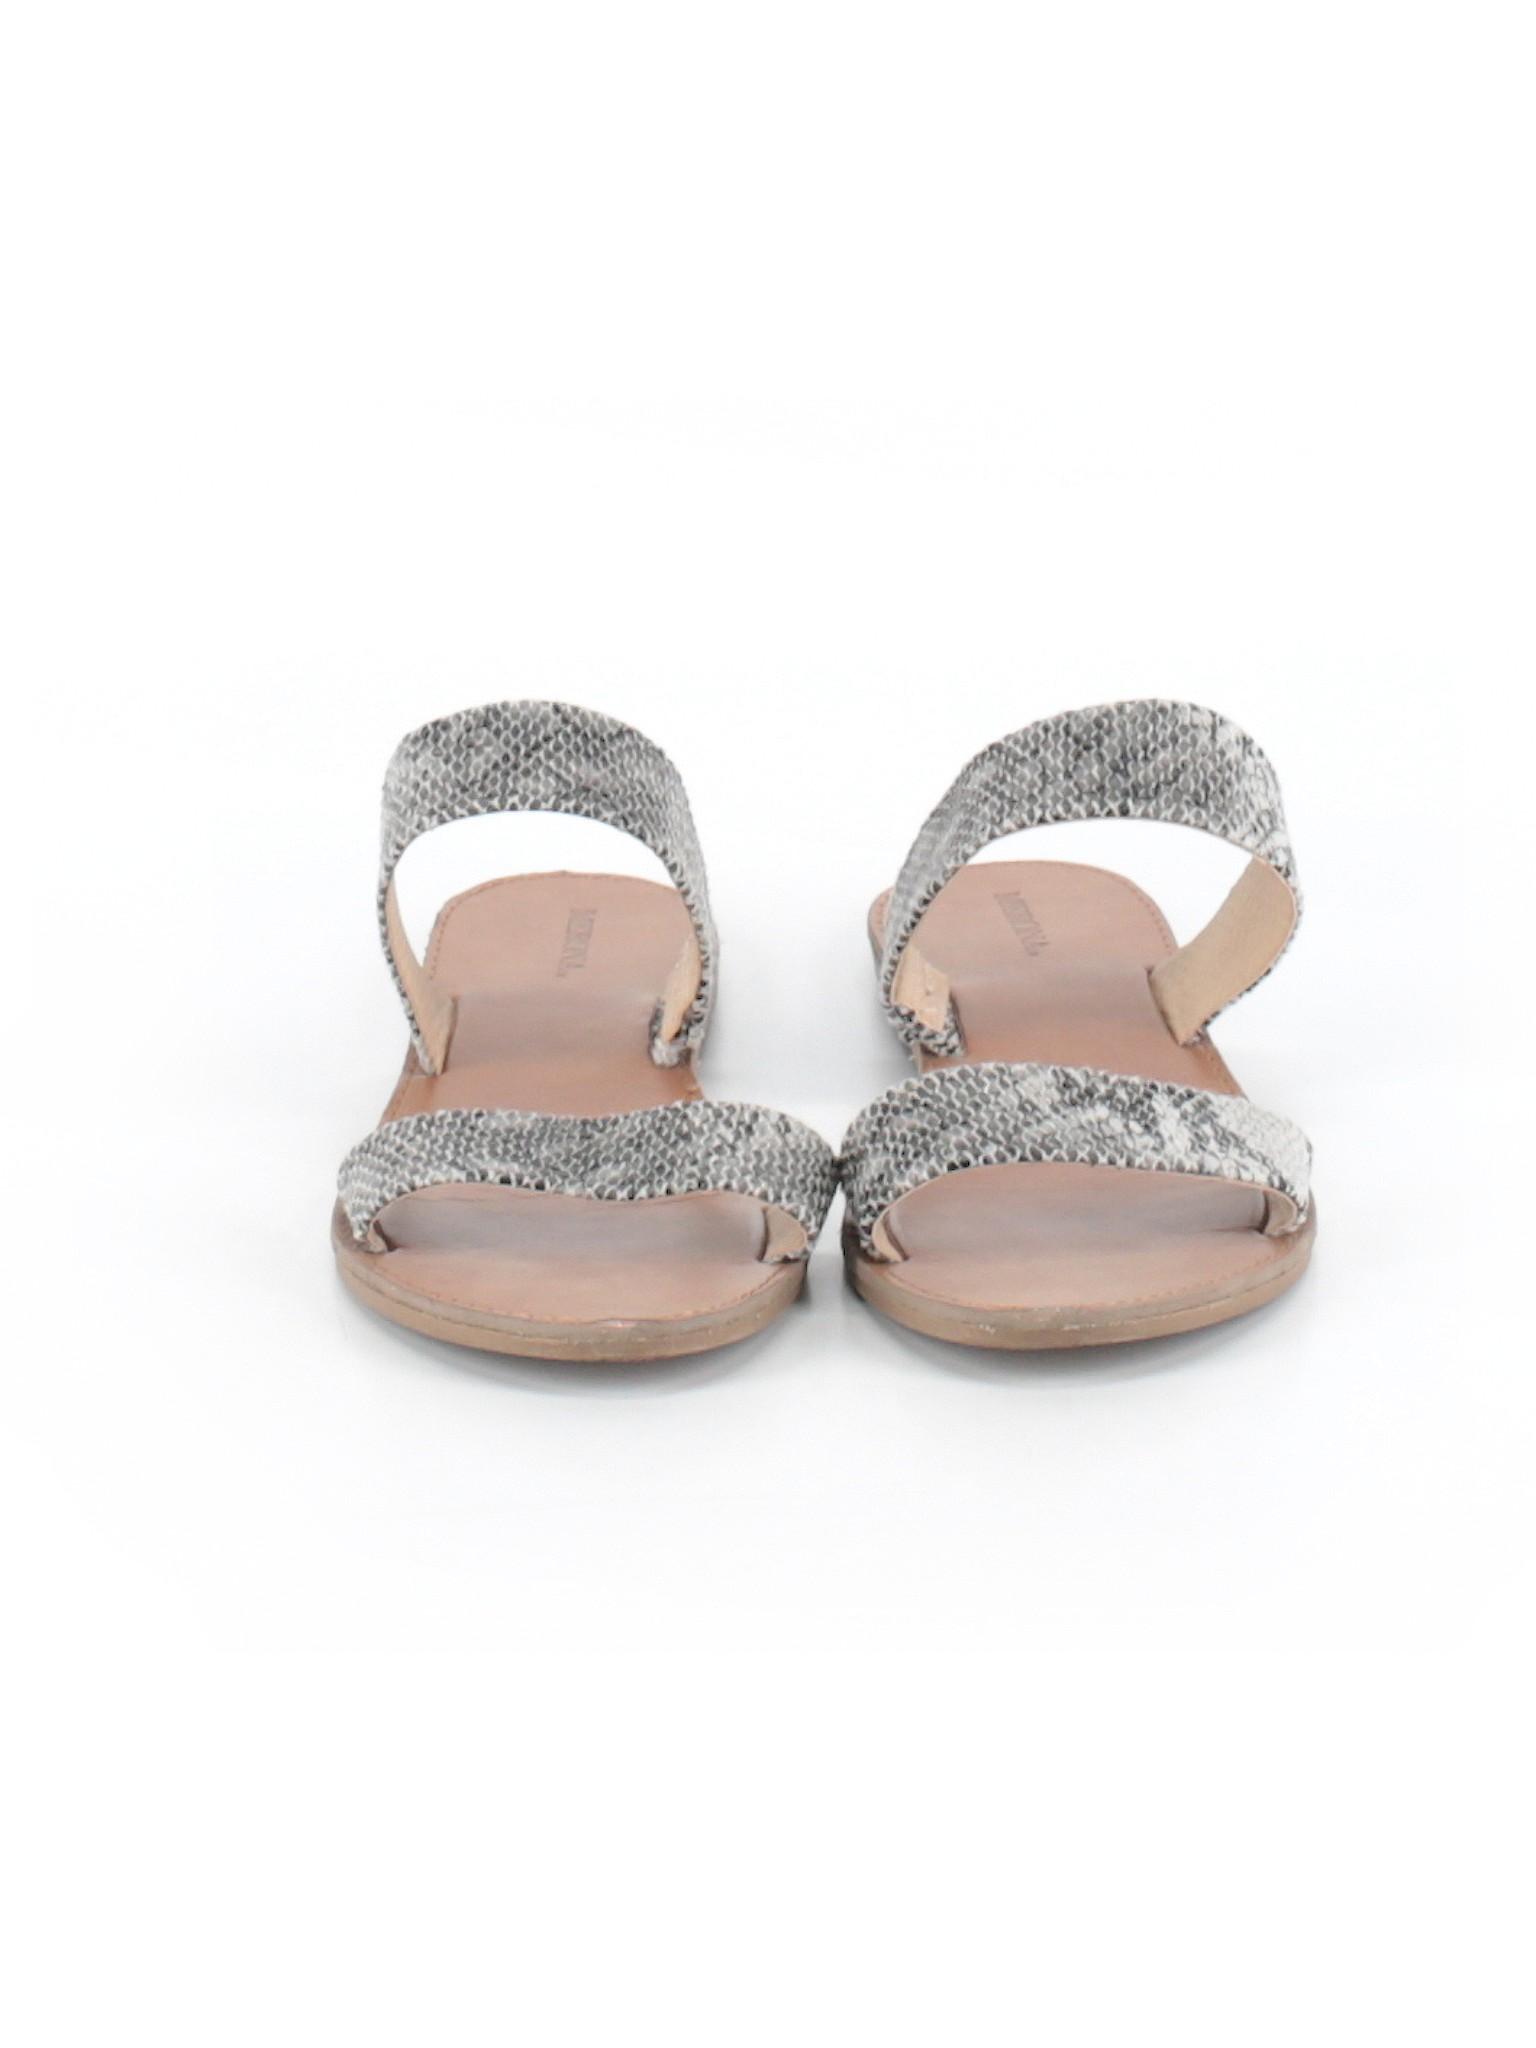 promotion promotion promotion Merona Merona Boutique Sandals Boutique Boutique Sandals Sandals Merona Boutique promotion 1Hdvq1